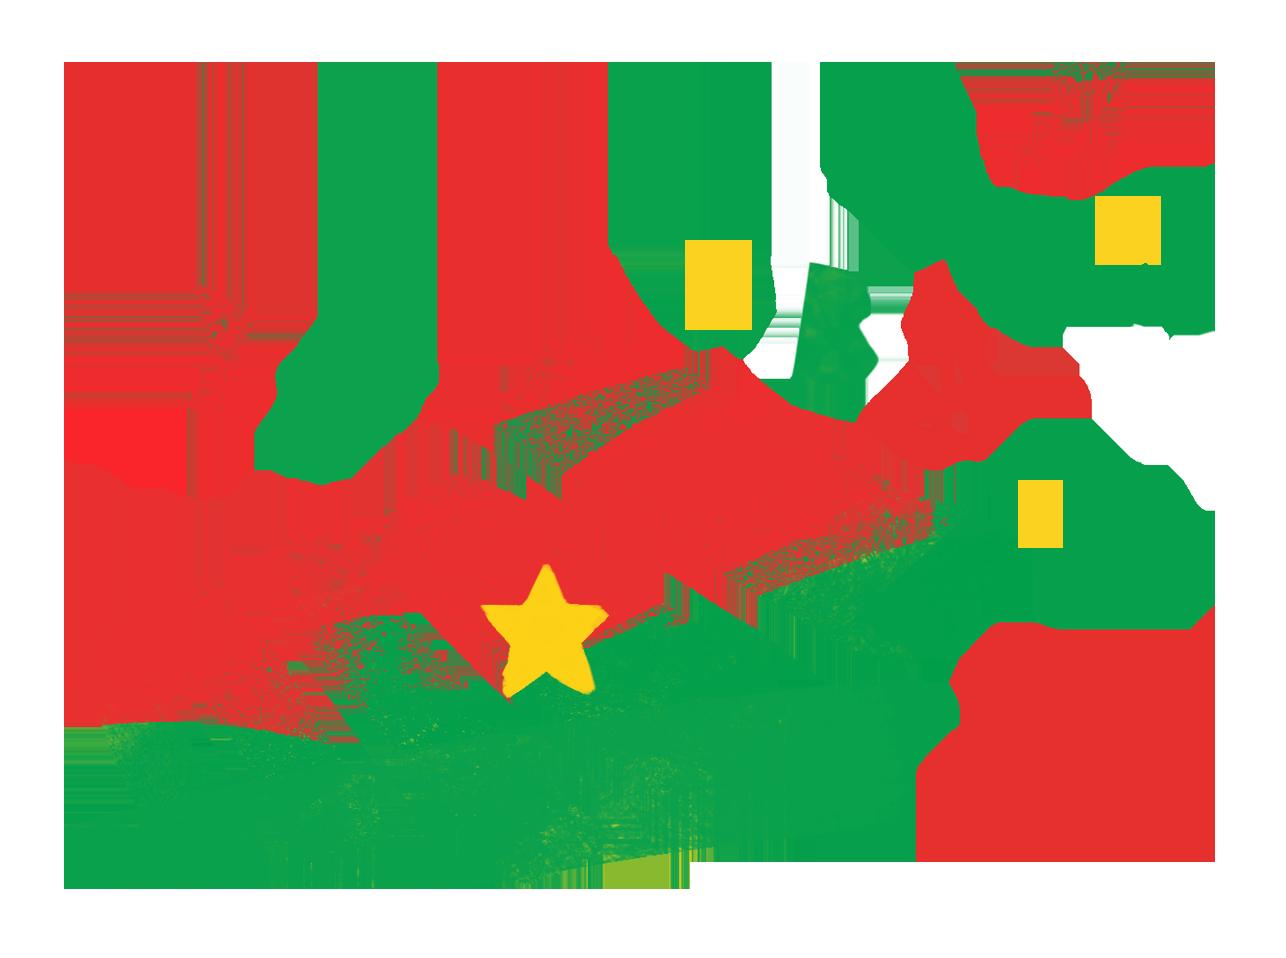 Logo Educafon (Balafon et lettres, drapeau du Burkina Faso)